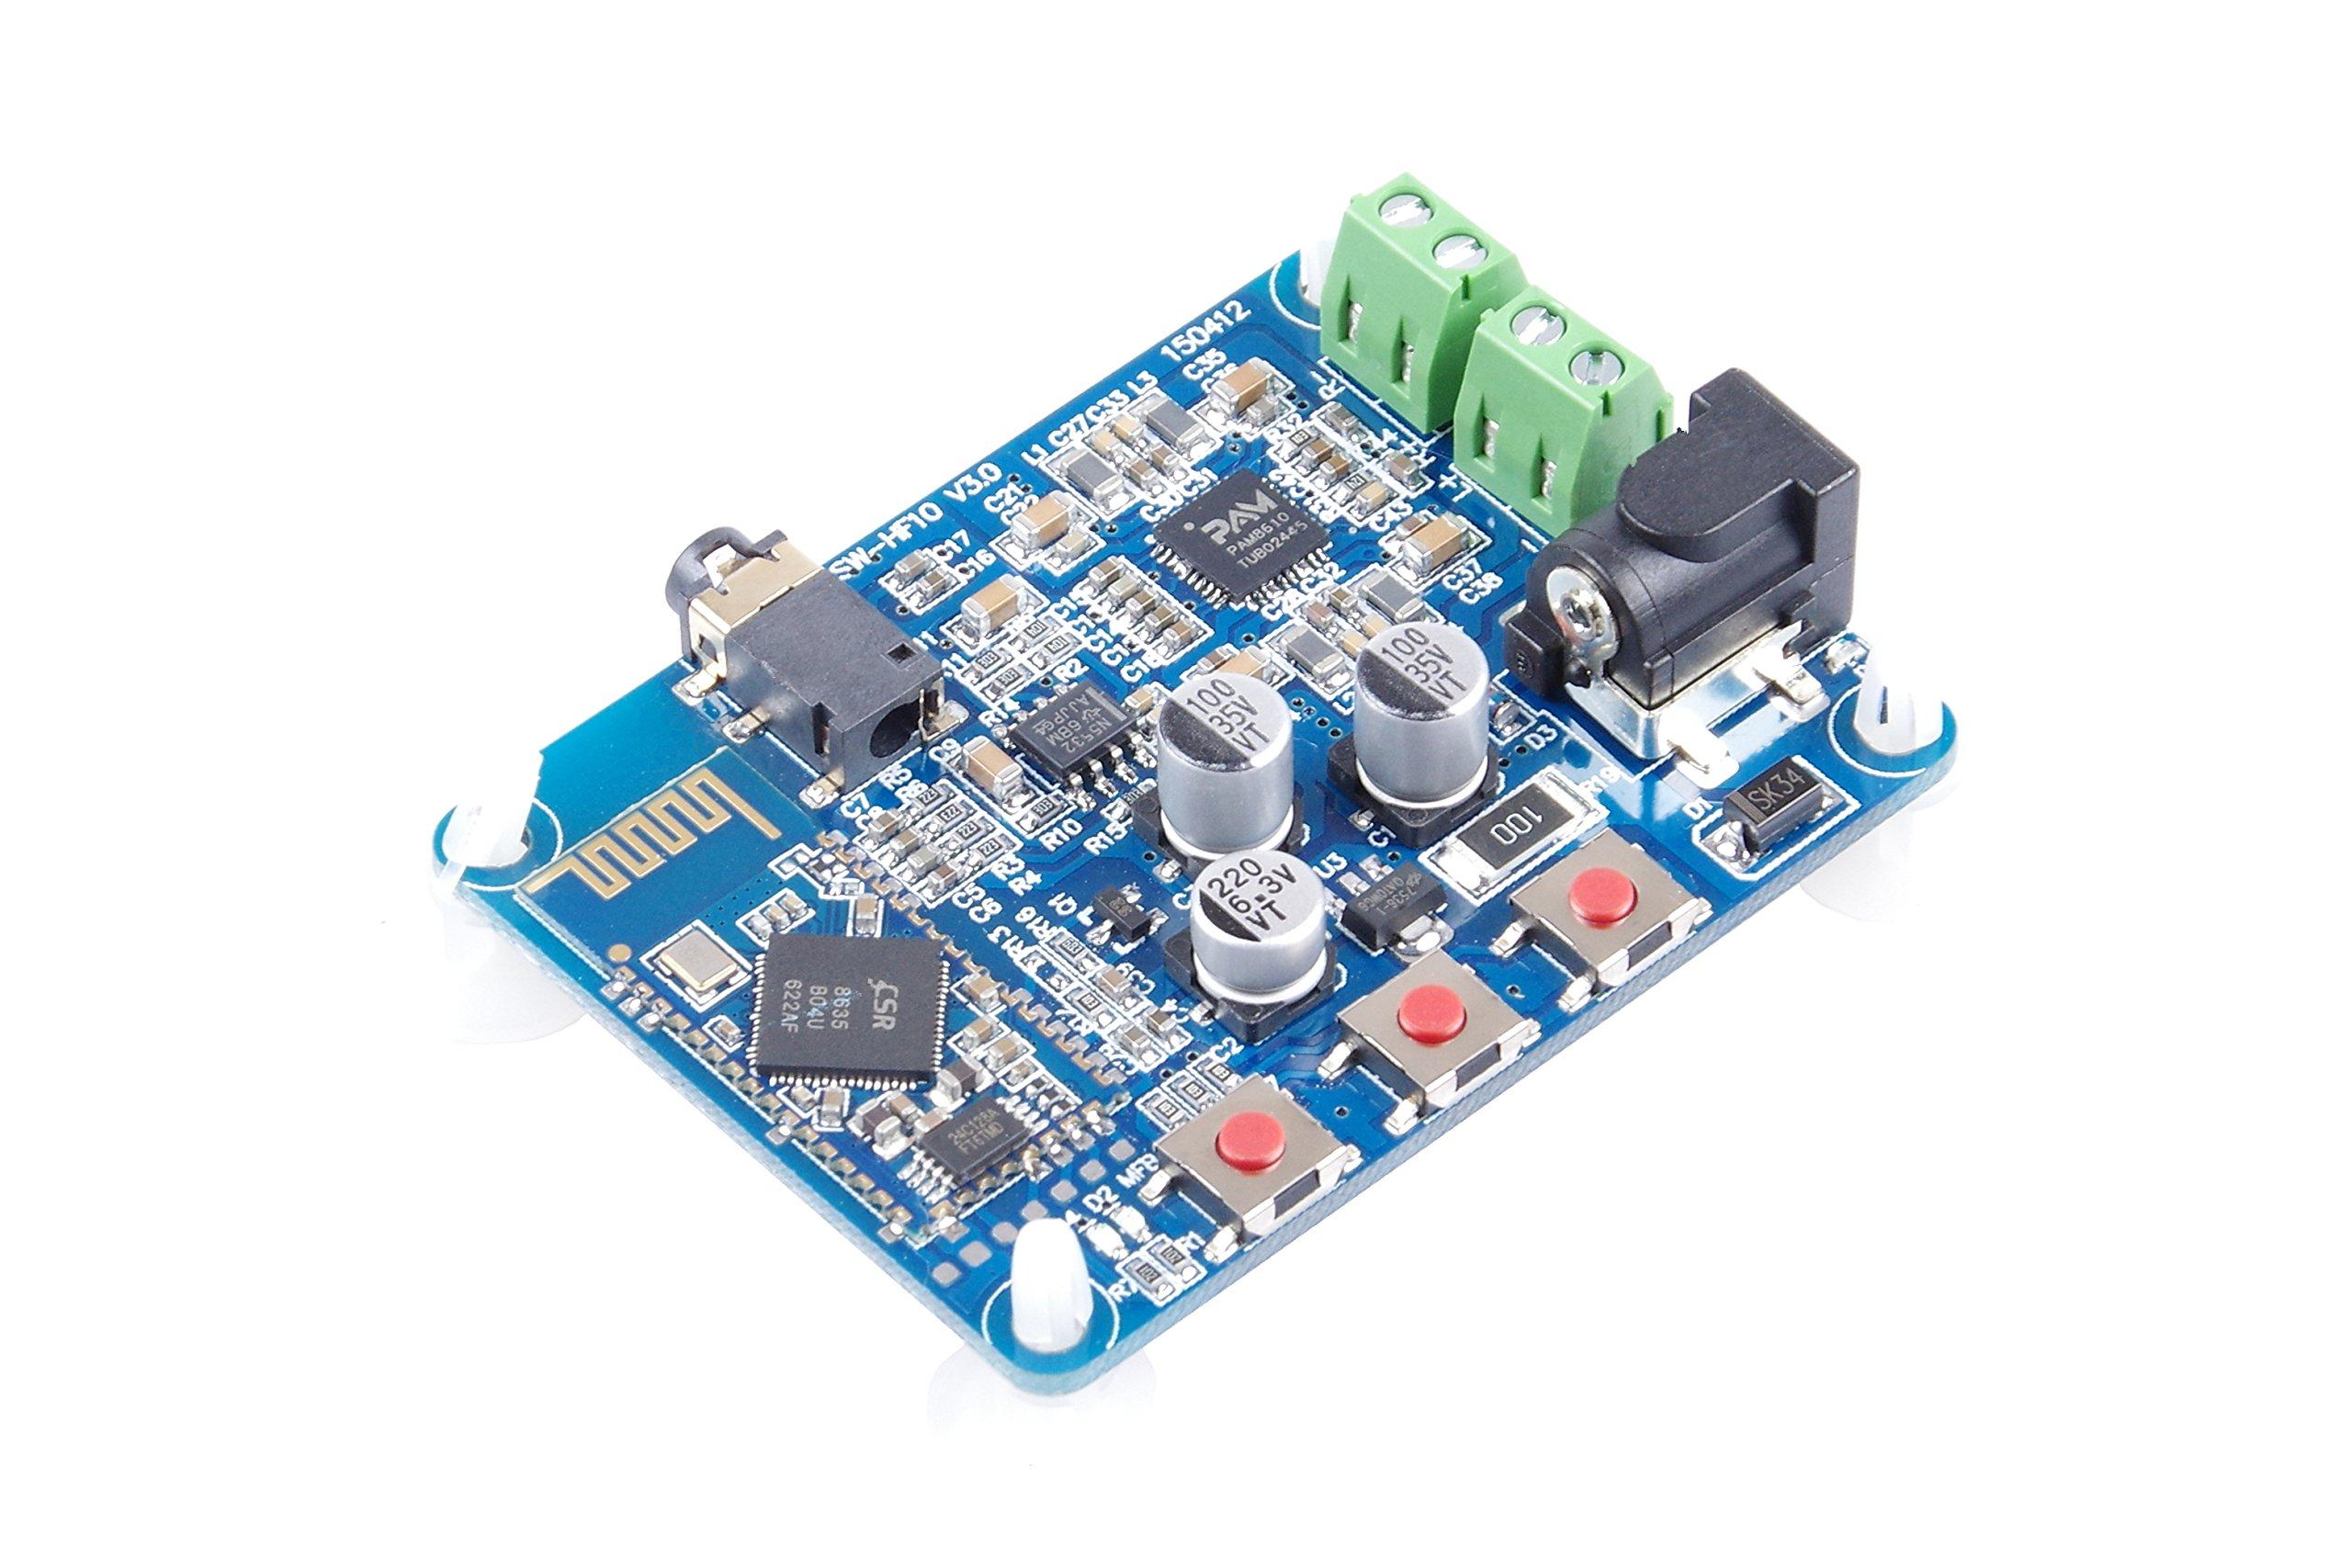 KNACRO 2-Channel Stereo Bluetooth Digital Amplifier Board 10W + 10W V4.0 Bluetooth Backward-compatible DC12V Power Supply